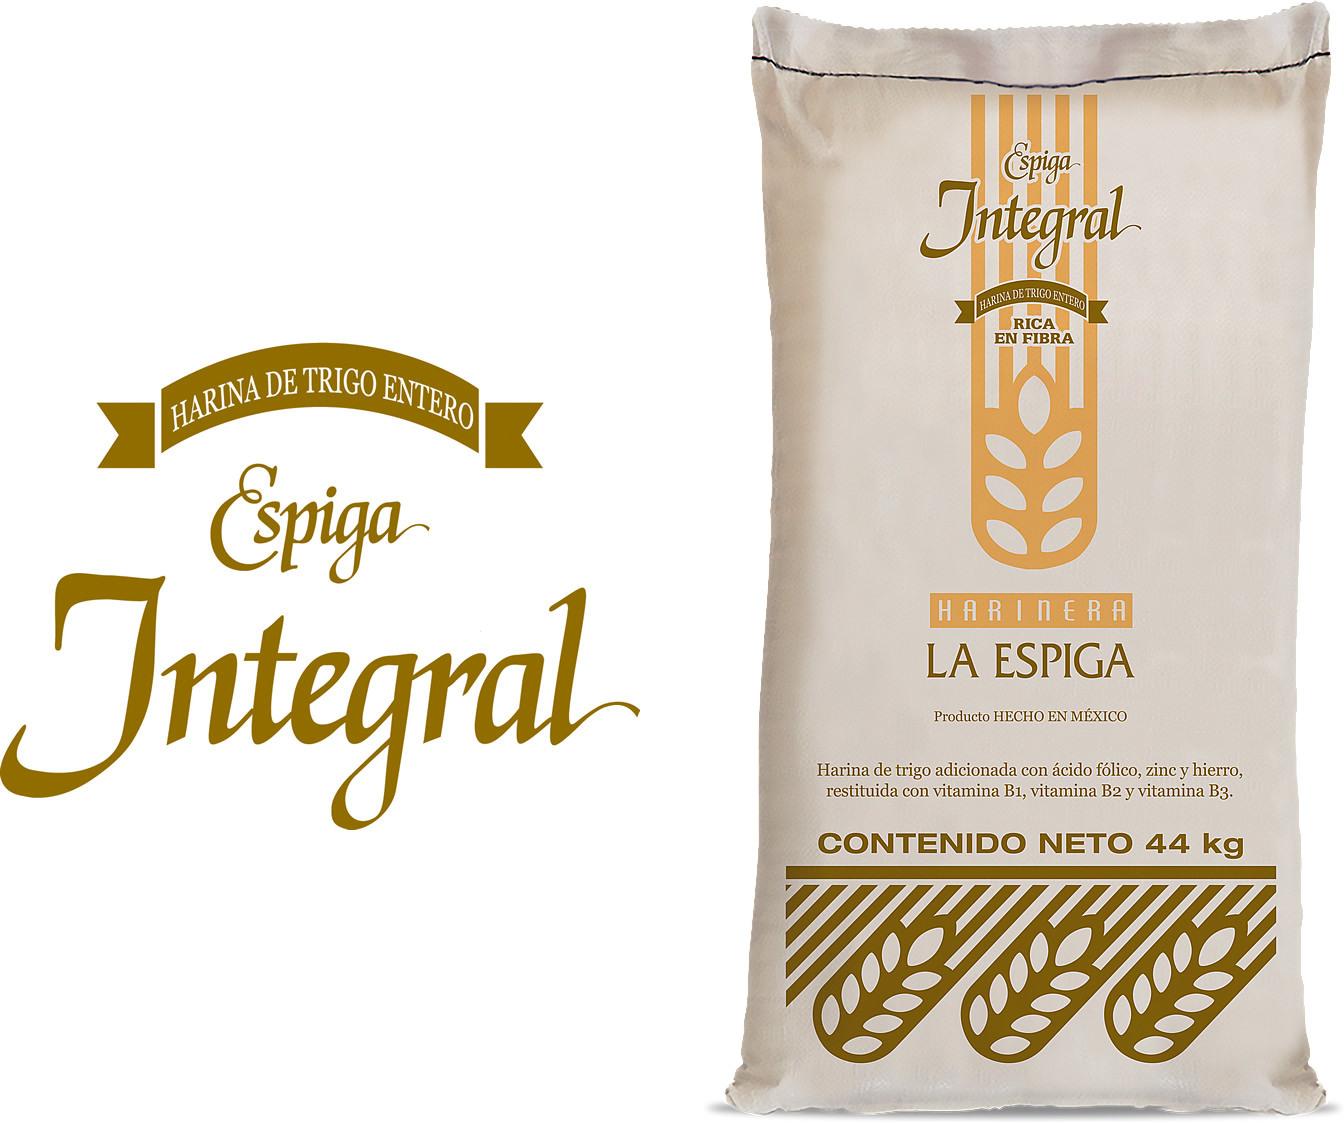 Espiga Integral is a multipurpose wheat flour perfect for whole-wheat breads.